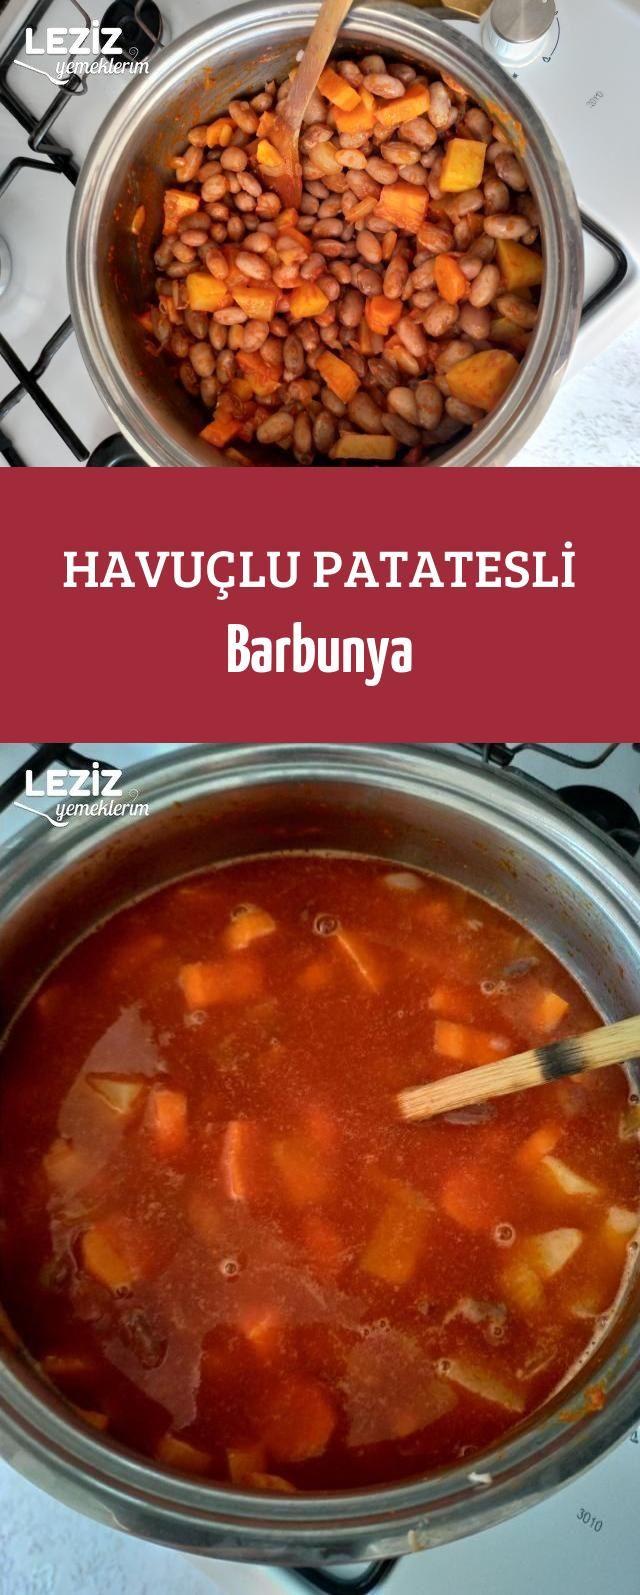 Güveçte Taze Barbunya Tarifi Videosu